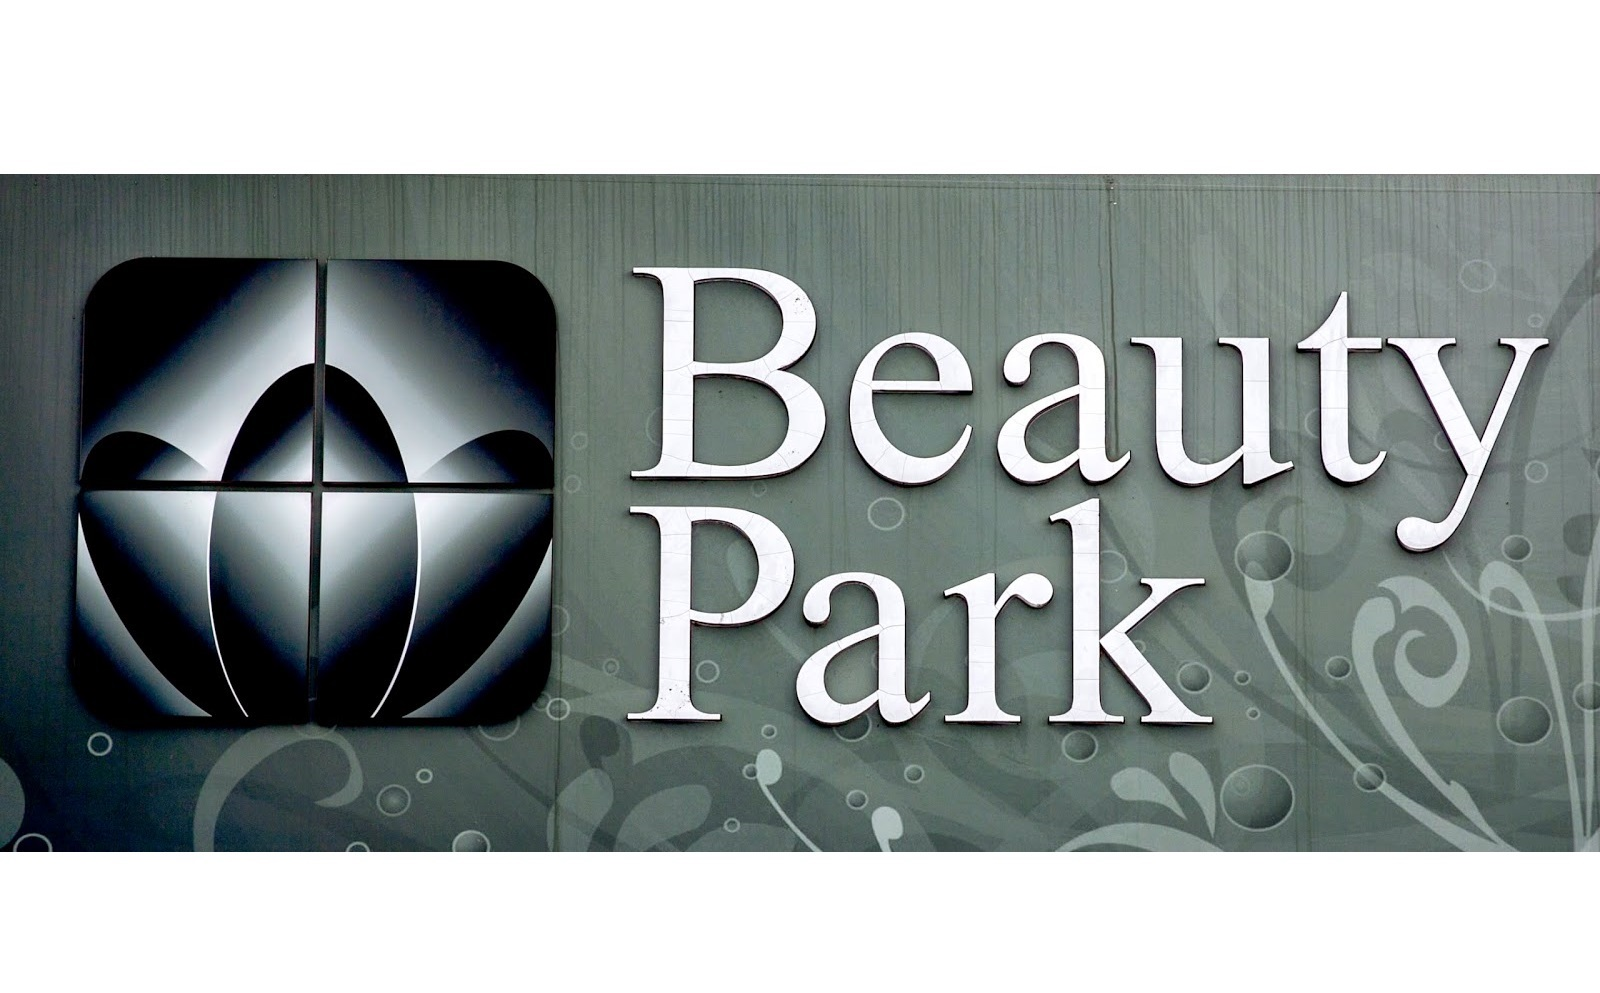 Beauty Park (뷰티 박)